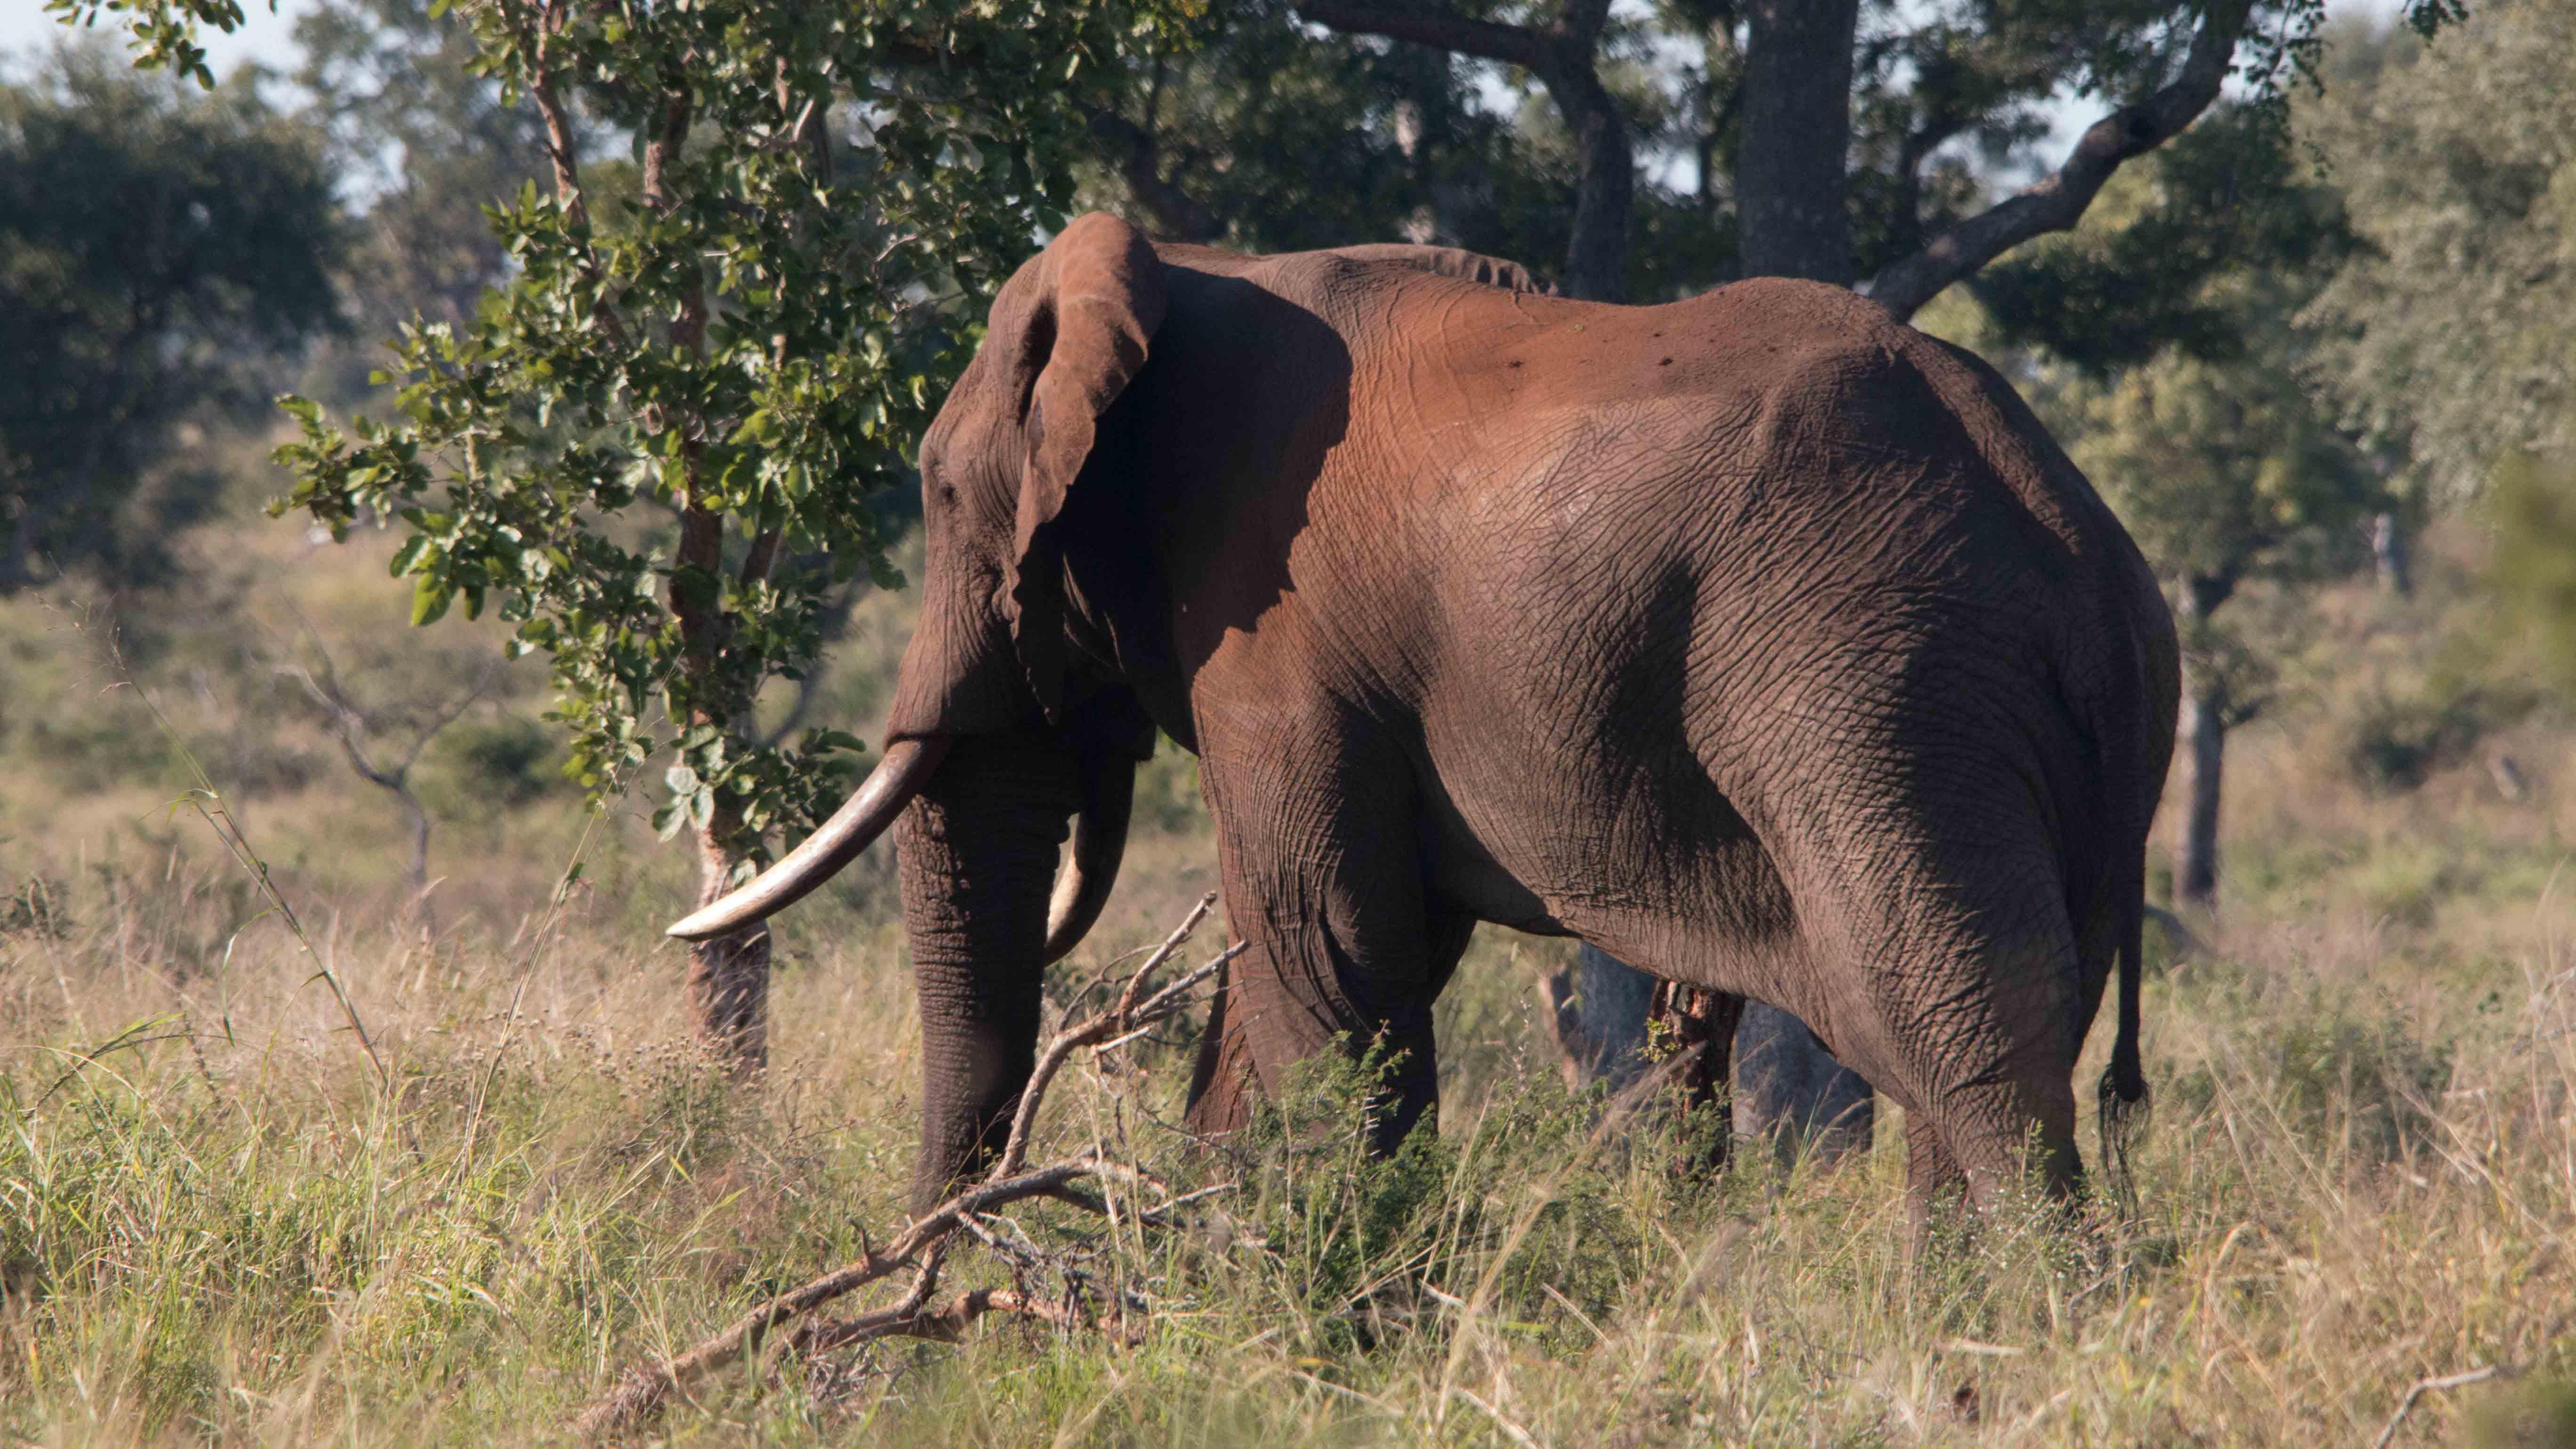 Elephant Densities in Africa. By Douglas Wise.